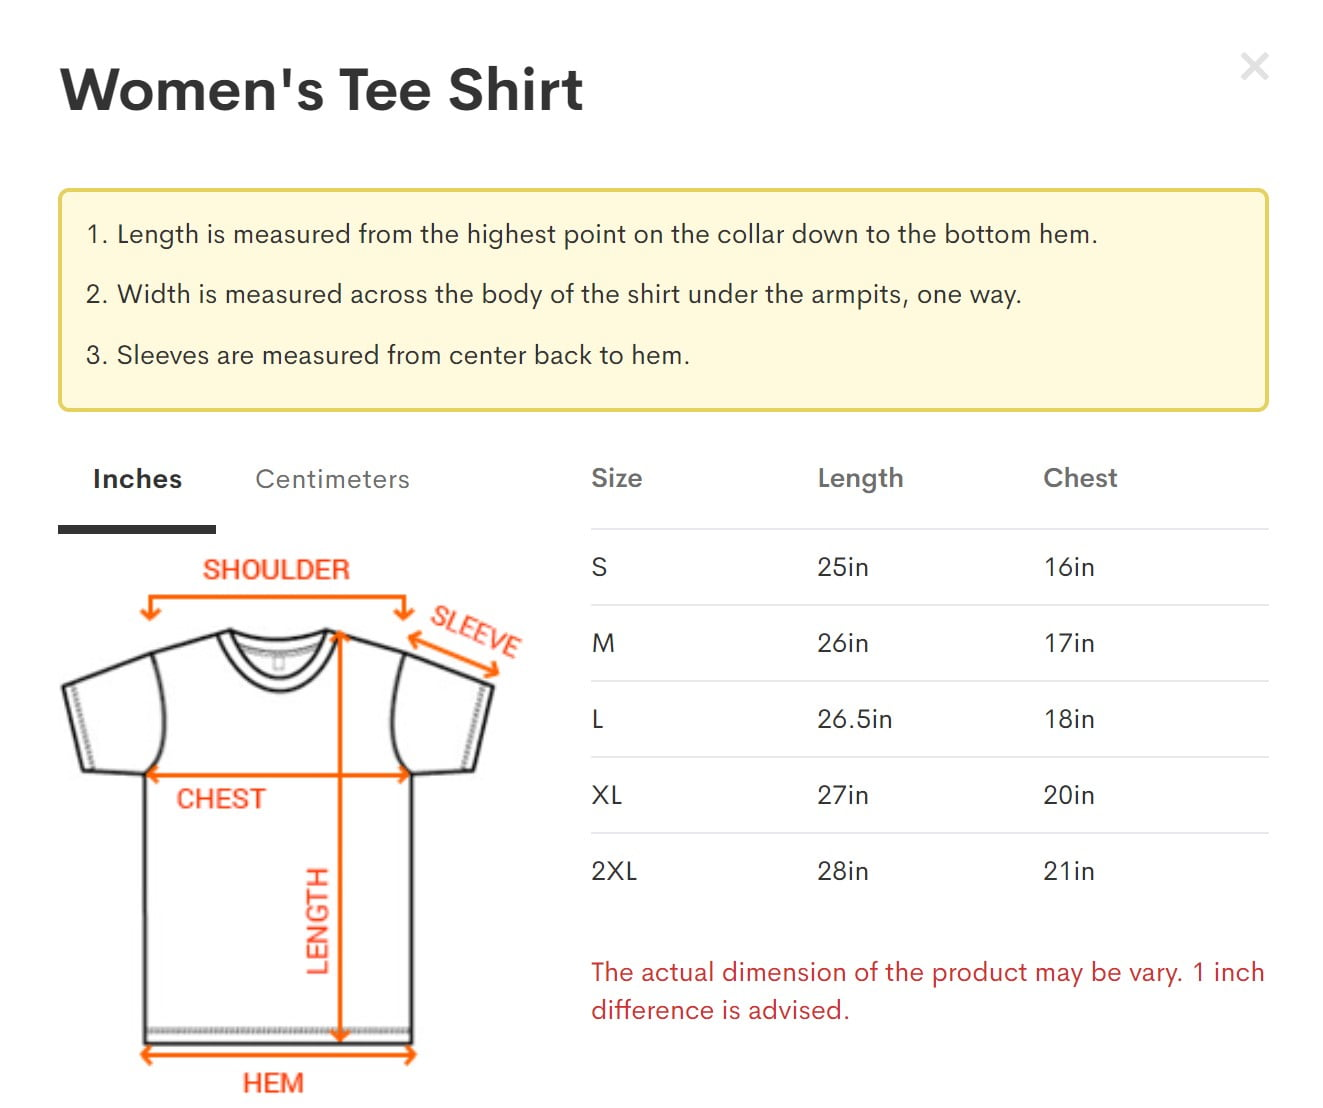 Women's Tee Shirt size